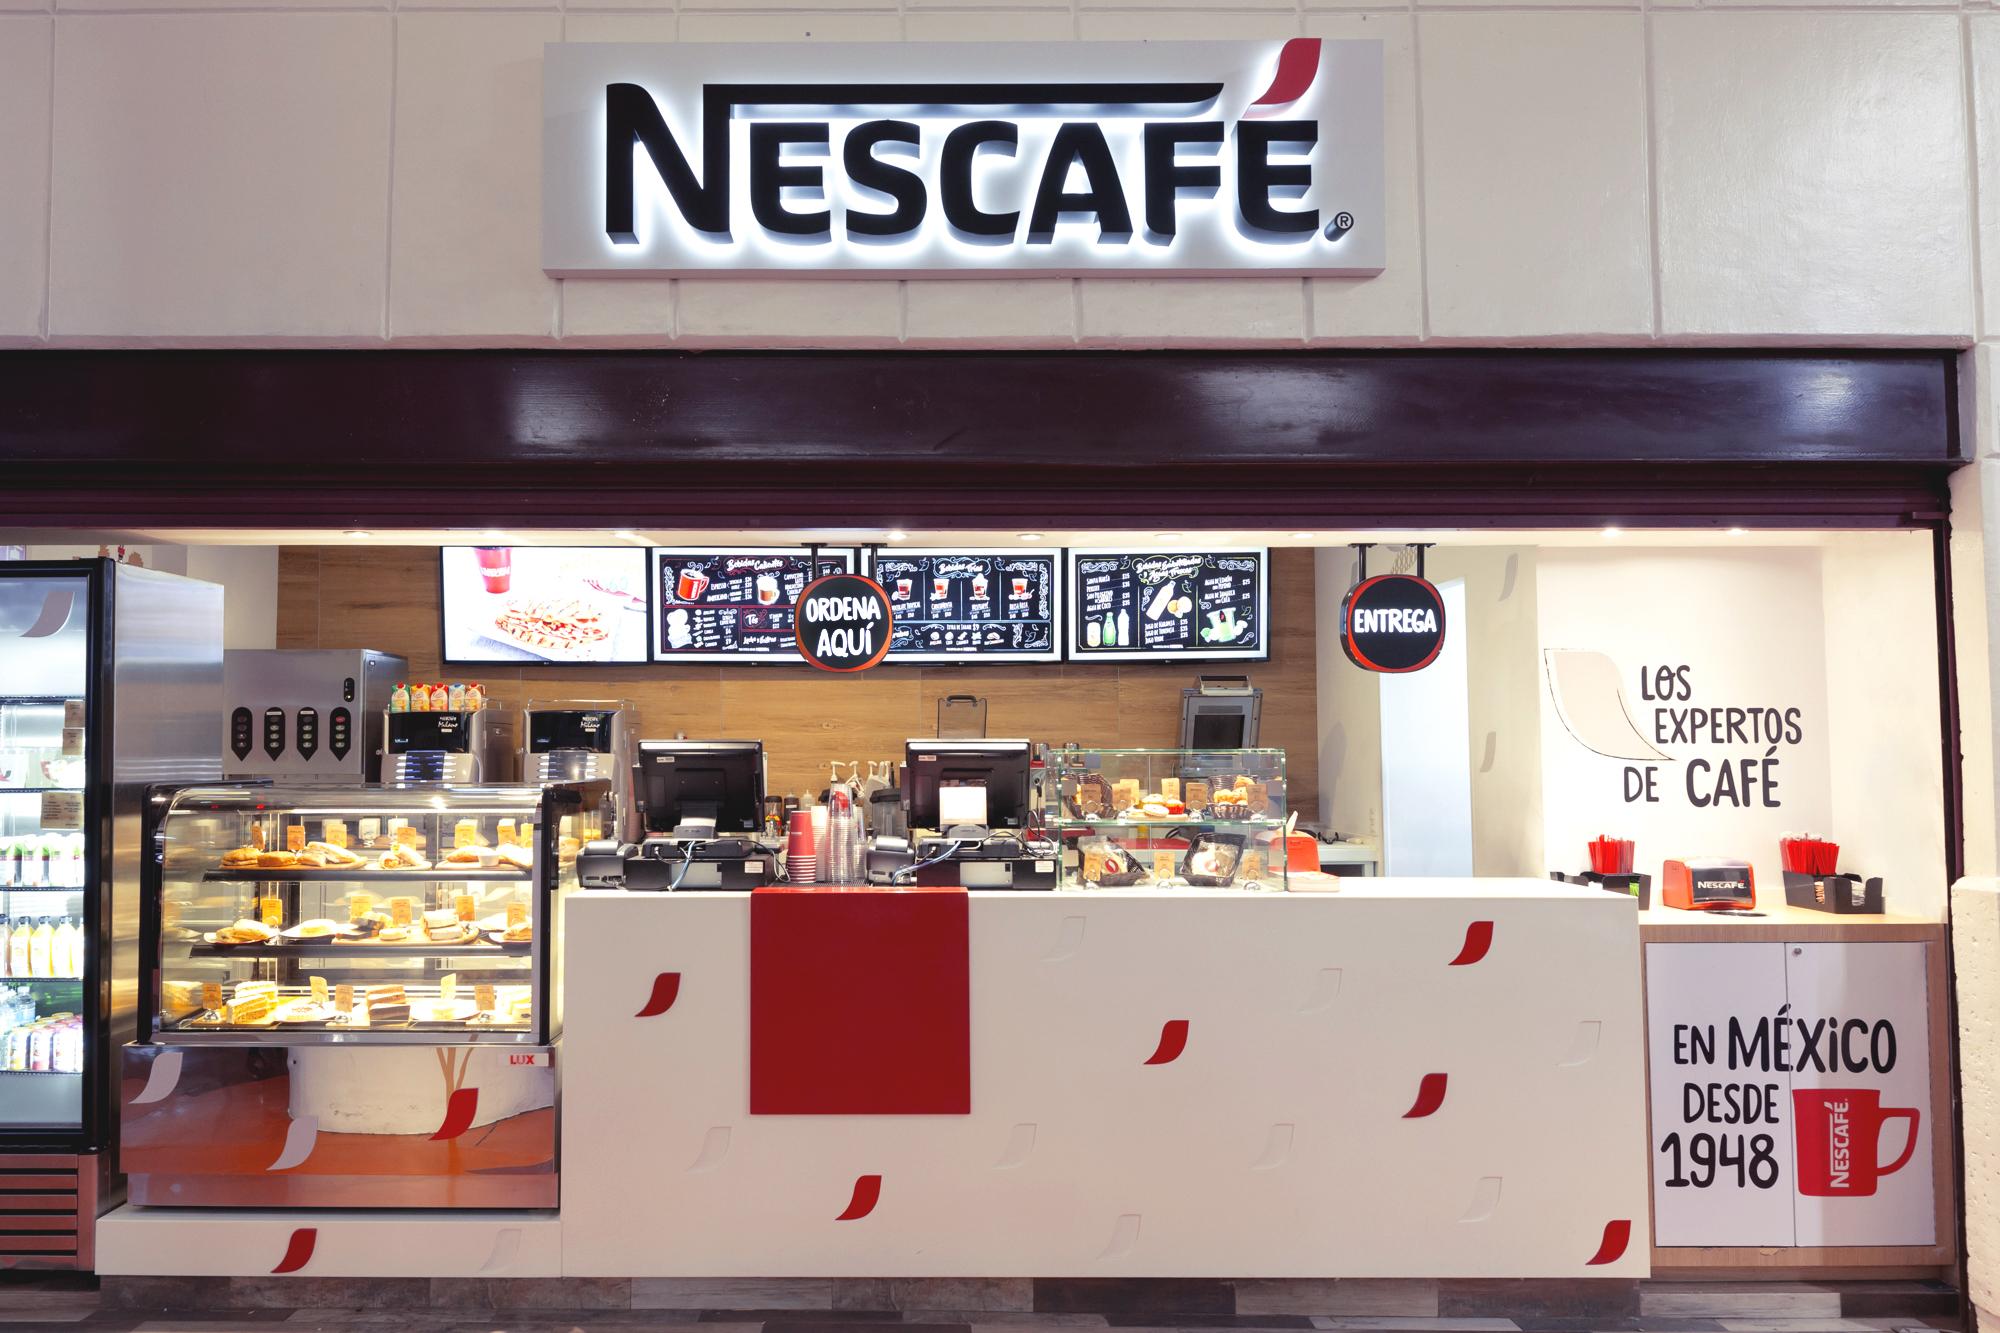 Nestlé y CMR abrirán 150 cafeterías Nescafé con 800 mdp